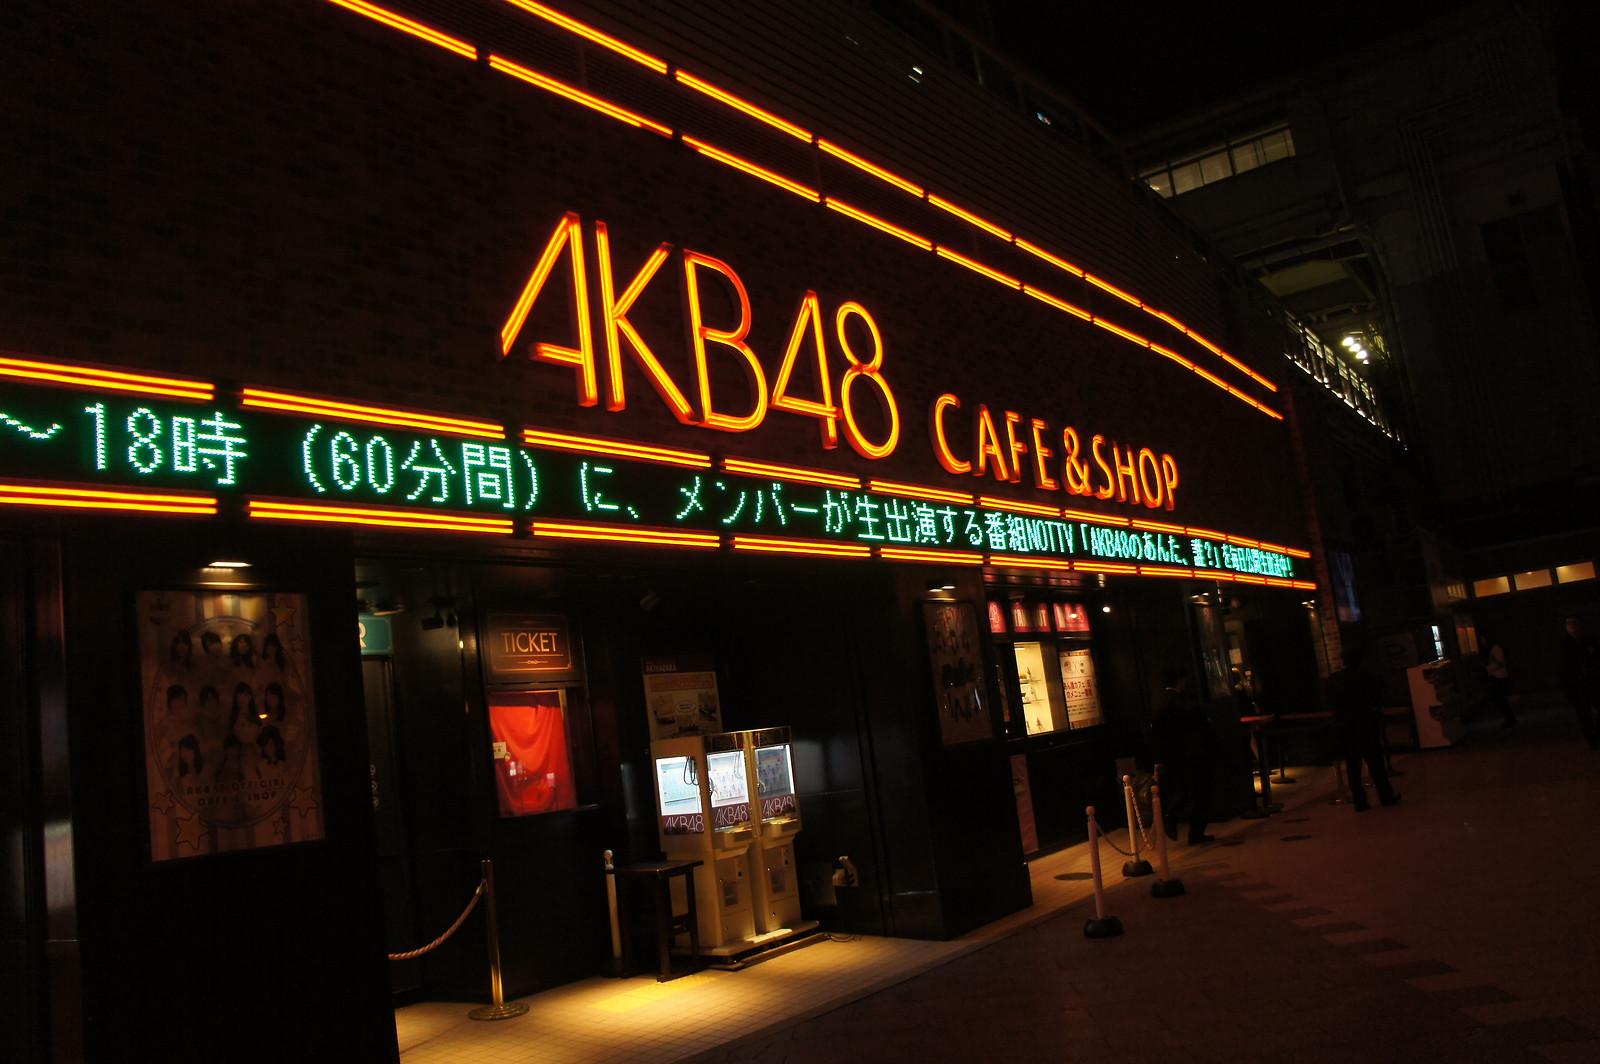 AKB48主题咖啡店 AKB48 CAFE&SHOP 秋叶原 歇业